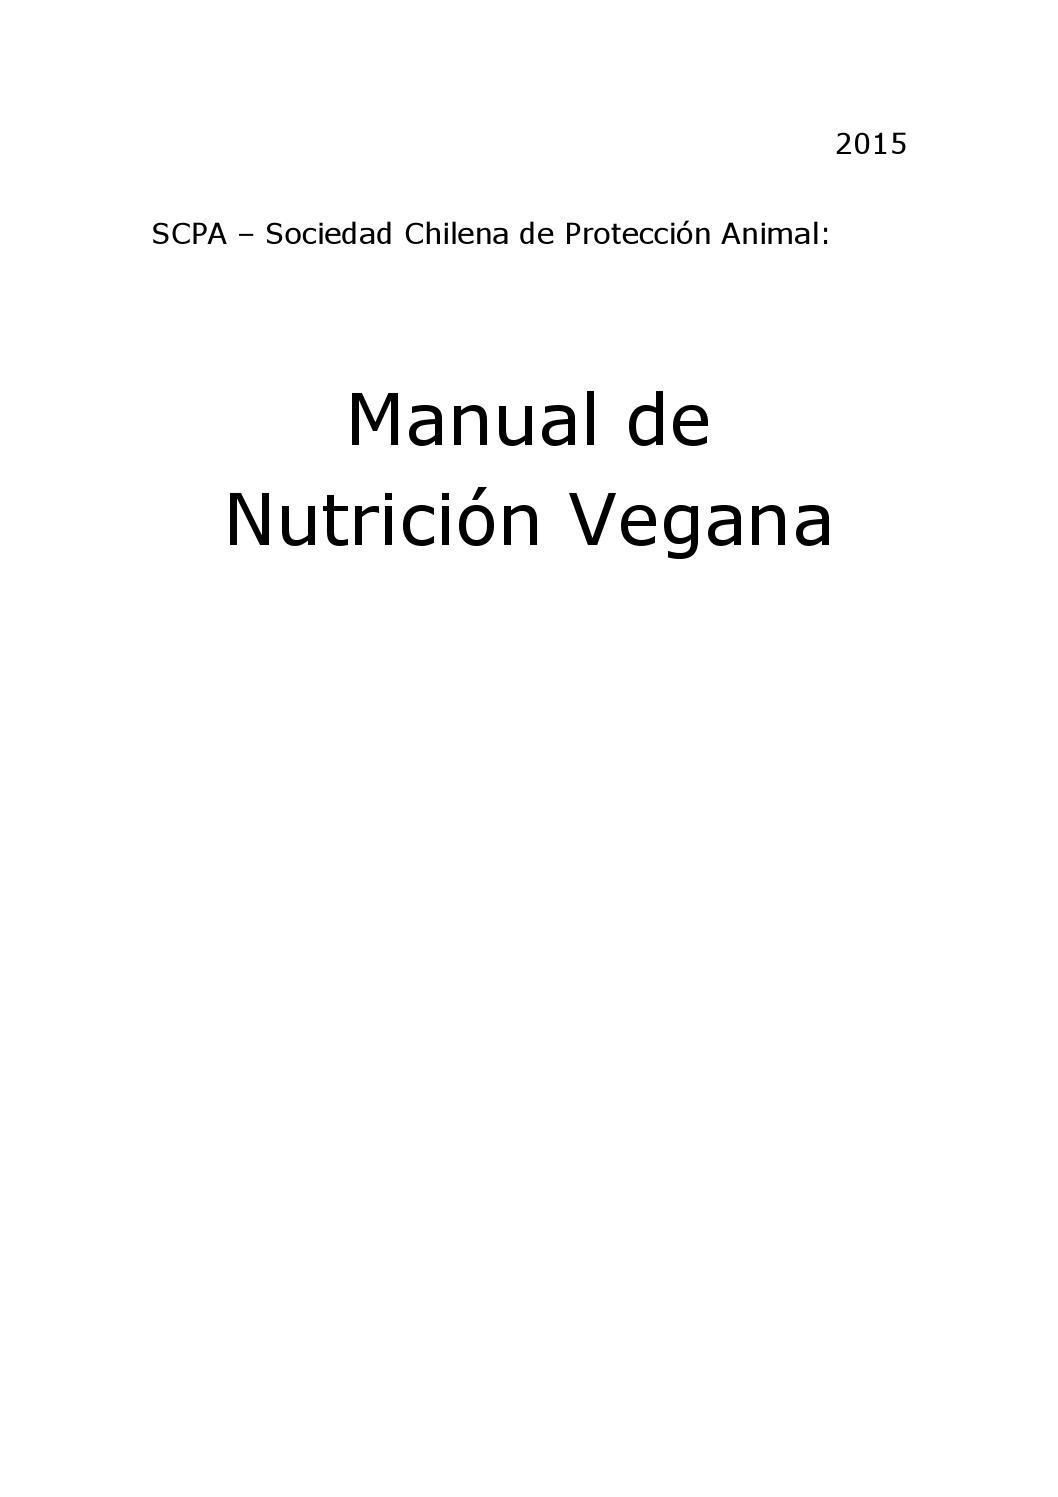 Dieta 1300 kcal vegetariana